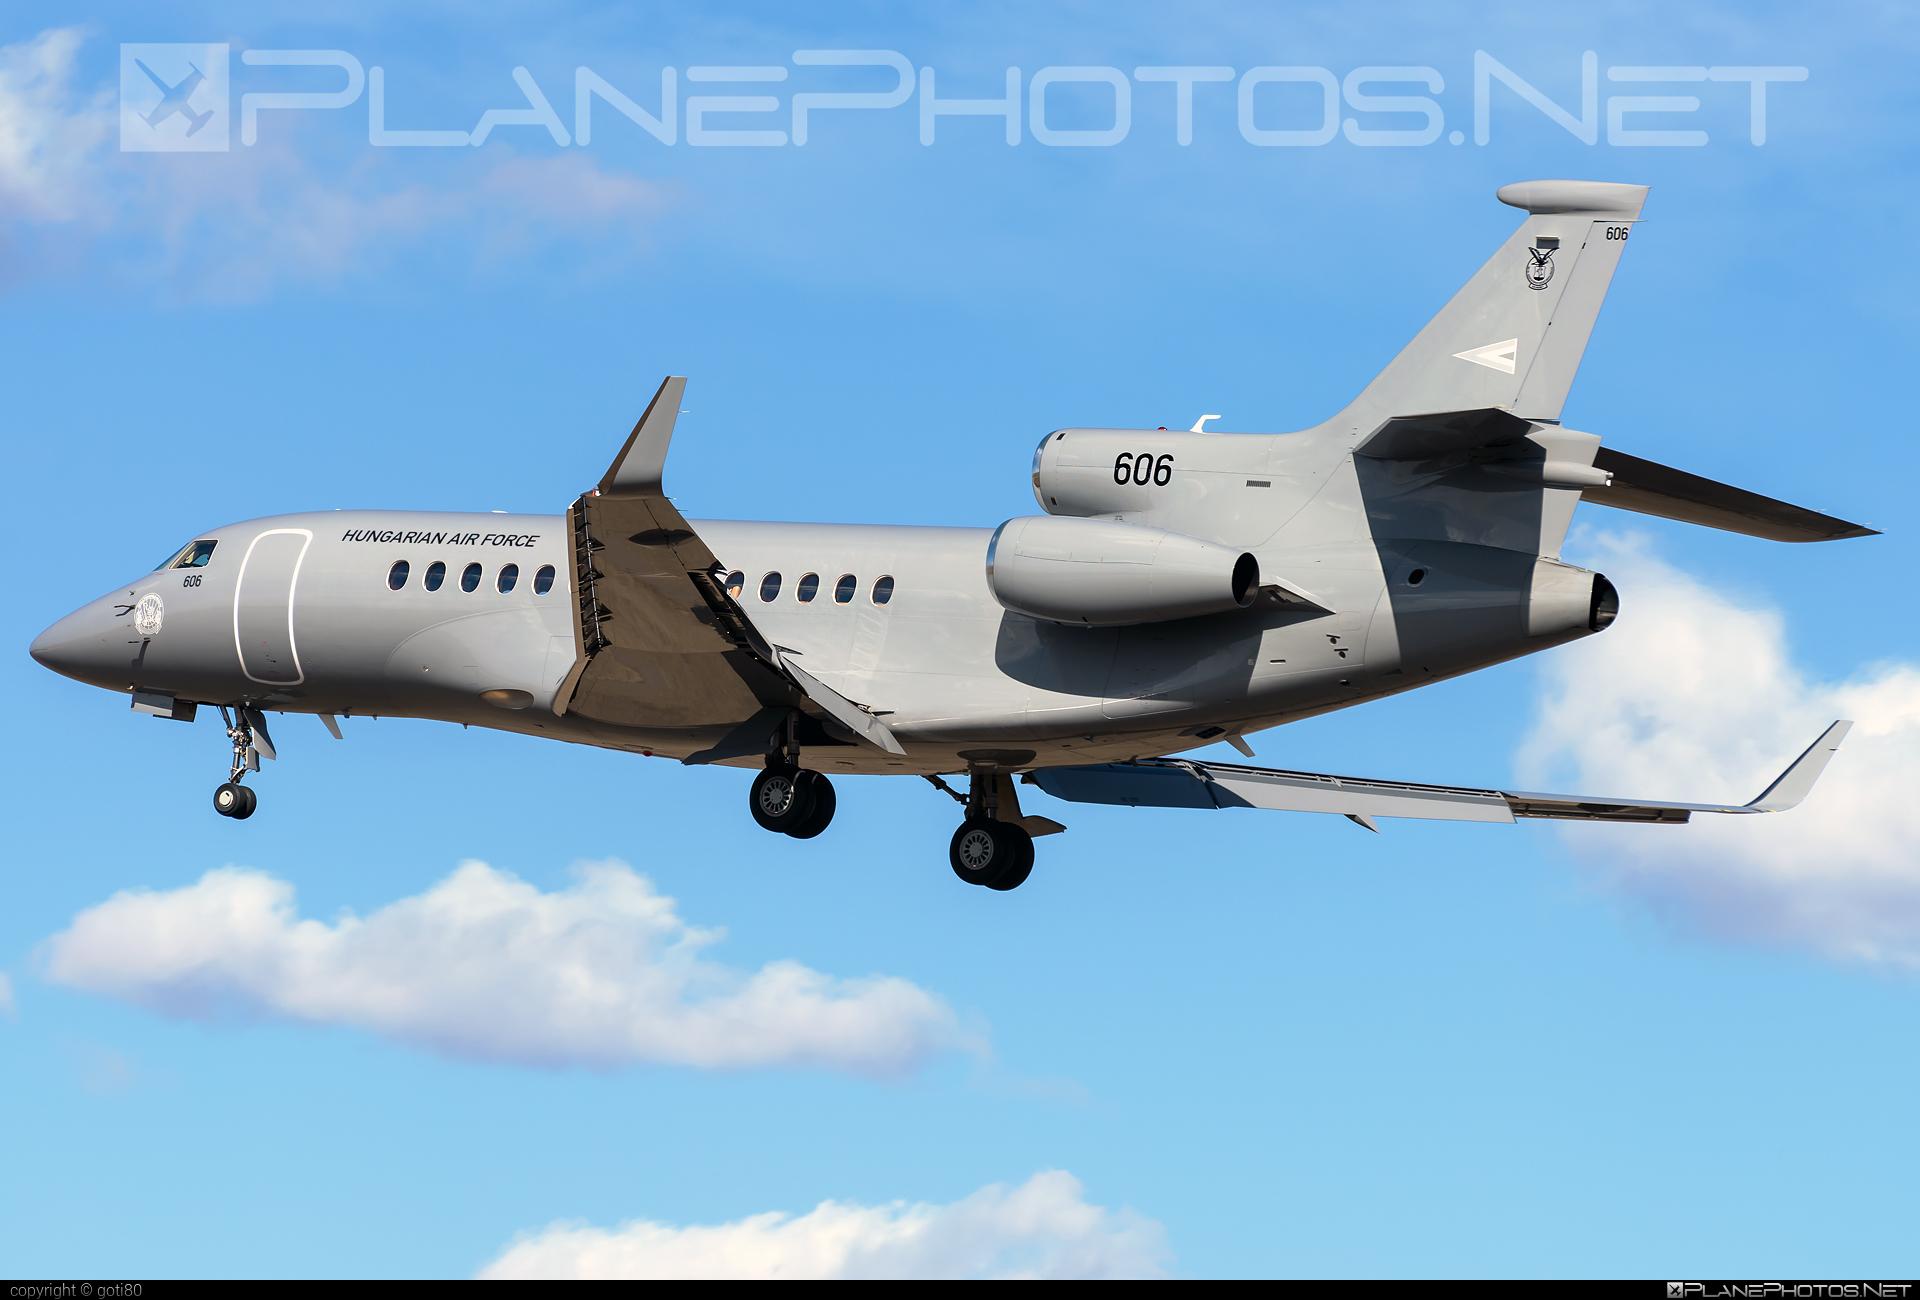 Magyar Légierő (Hungarian Air Force) Dassault Falcon 7X - 606 #dassault #dassaultfalcon #dassaultfalcon7x #falcon7x #hungarianairforce #magyarlegiero